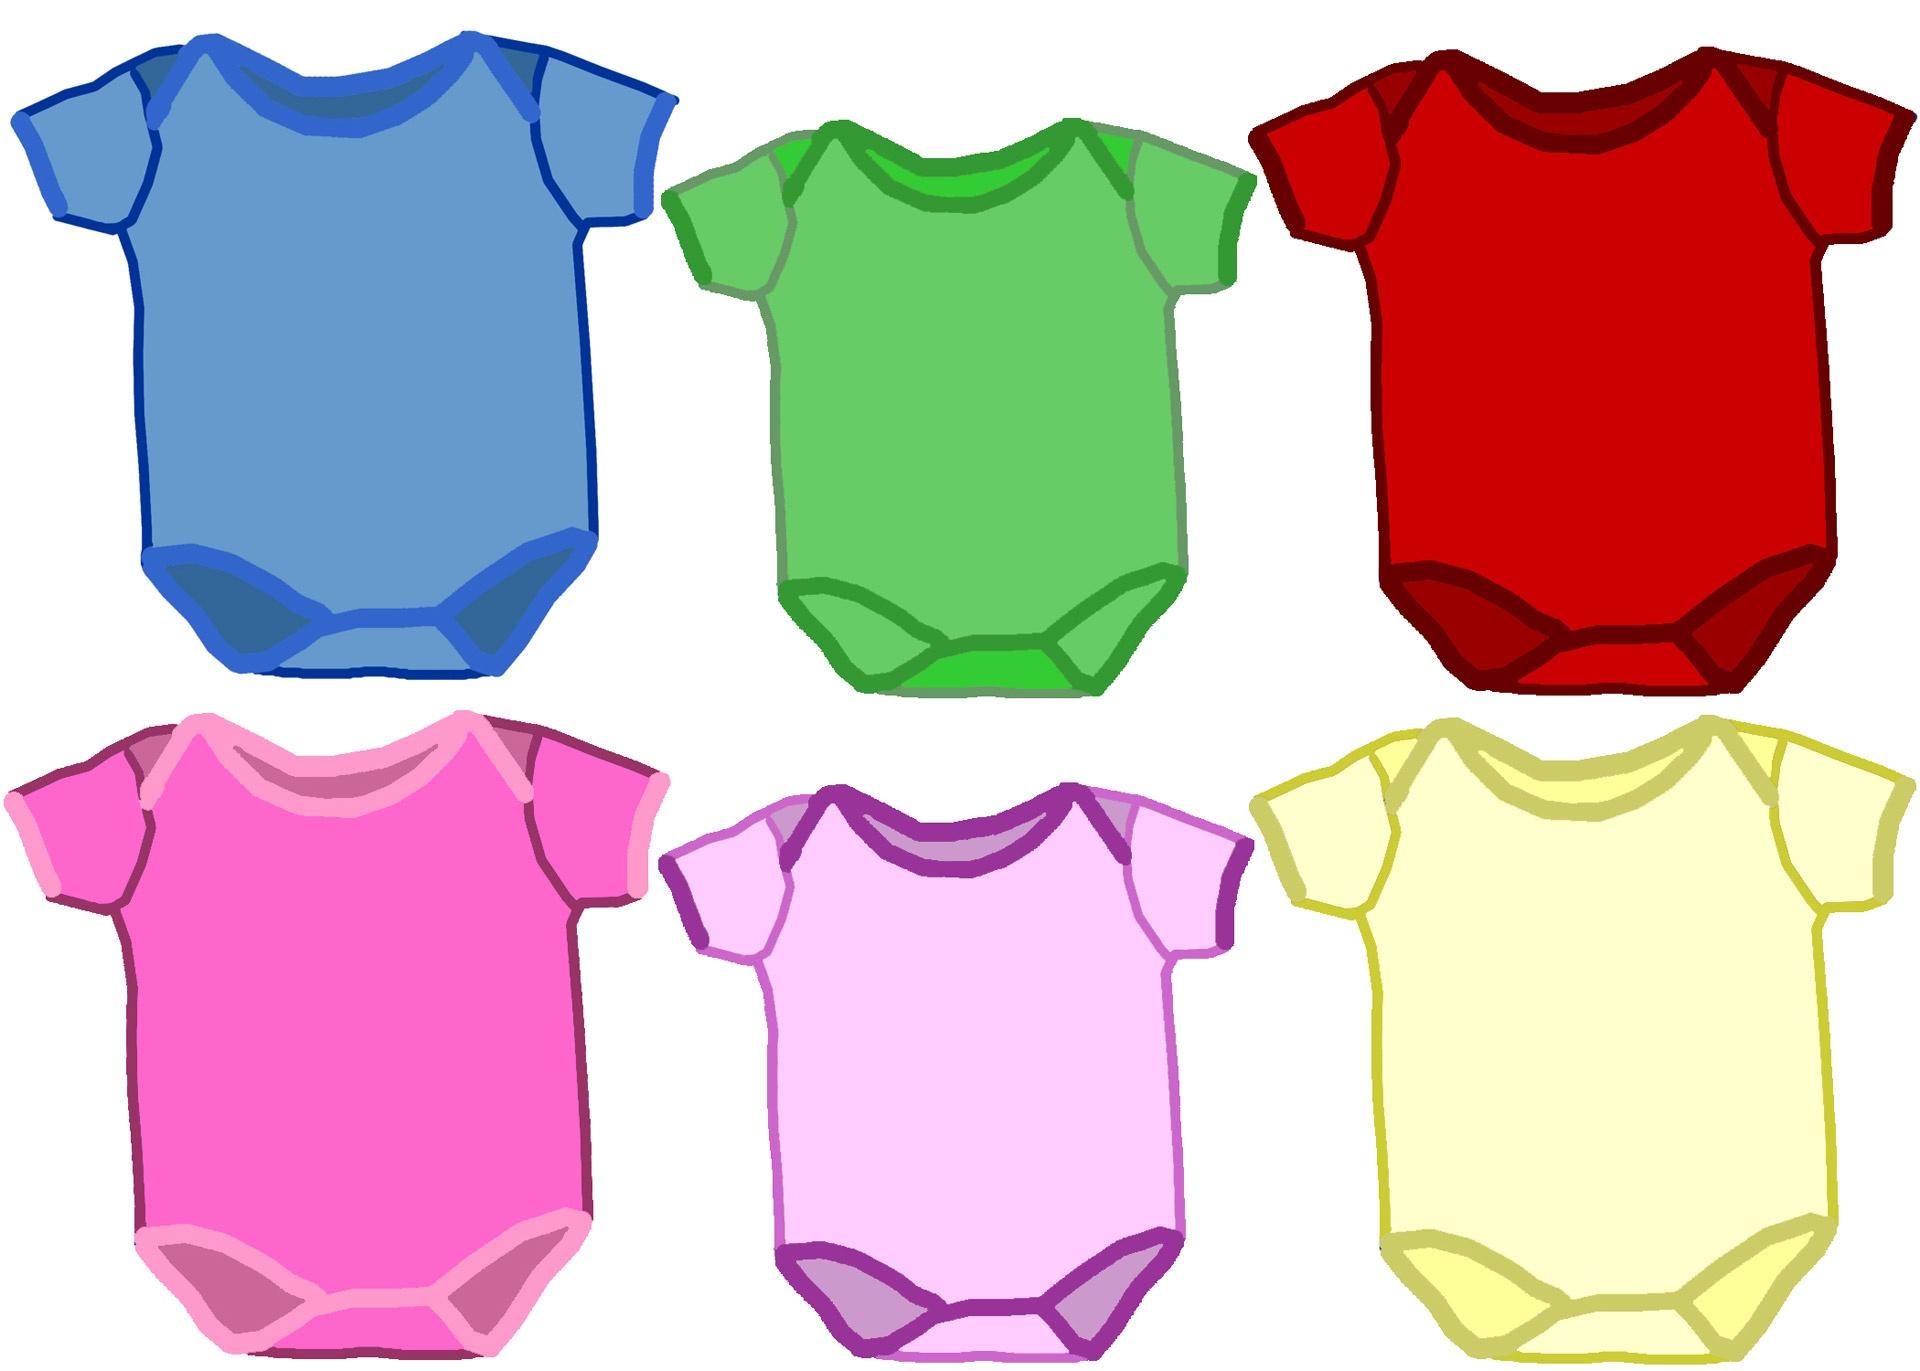 Baby Girl Onesies Clipart   Free Download Best Baby Girl Onesies - Free Printable Onesies